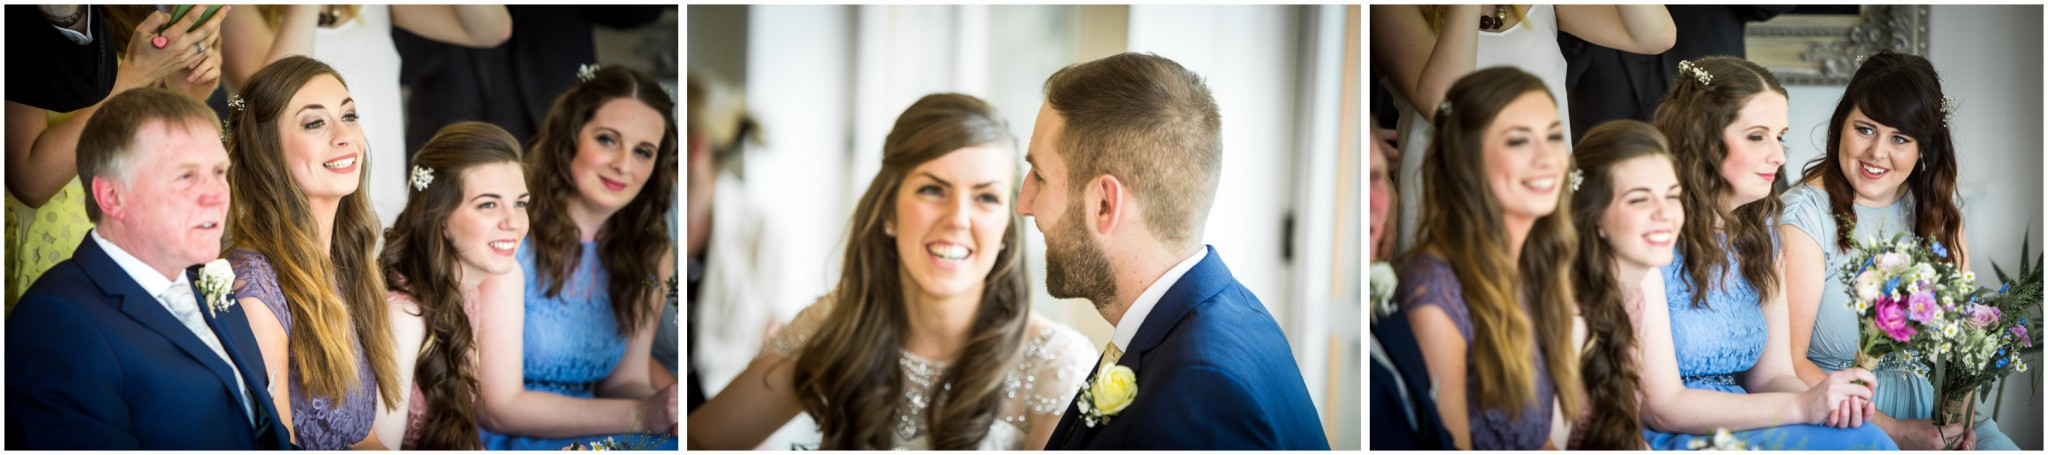 Wasing Park Wedding Photography wedding ceremony reaction